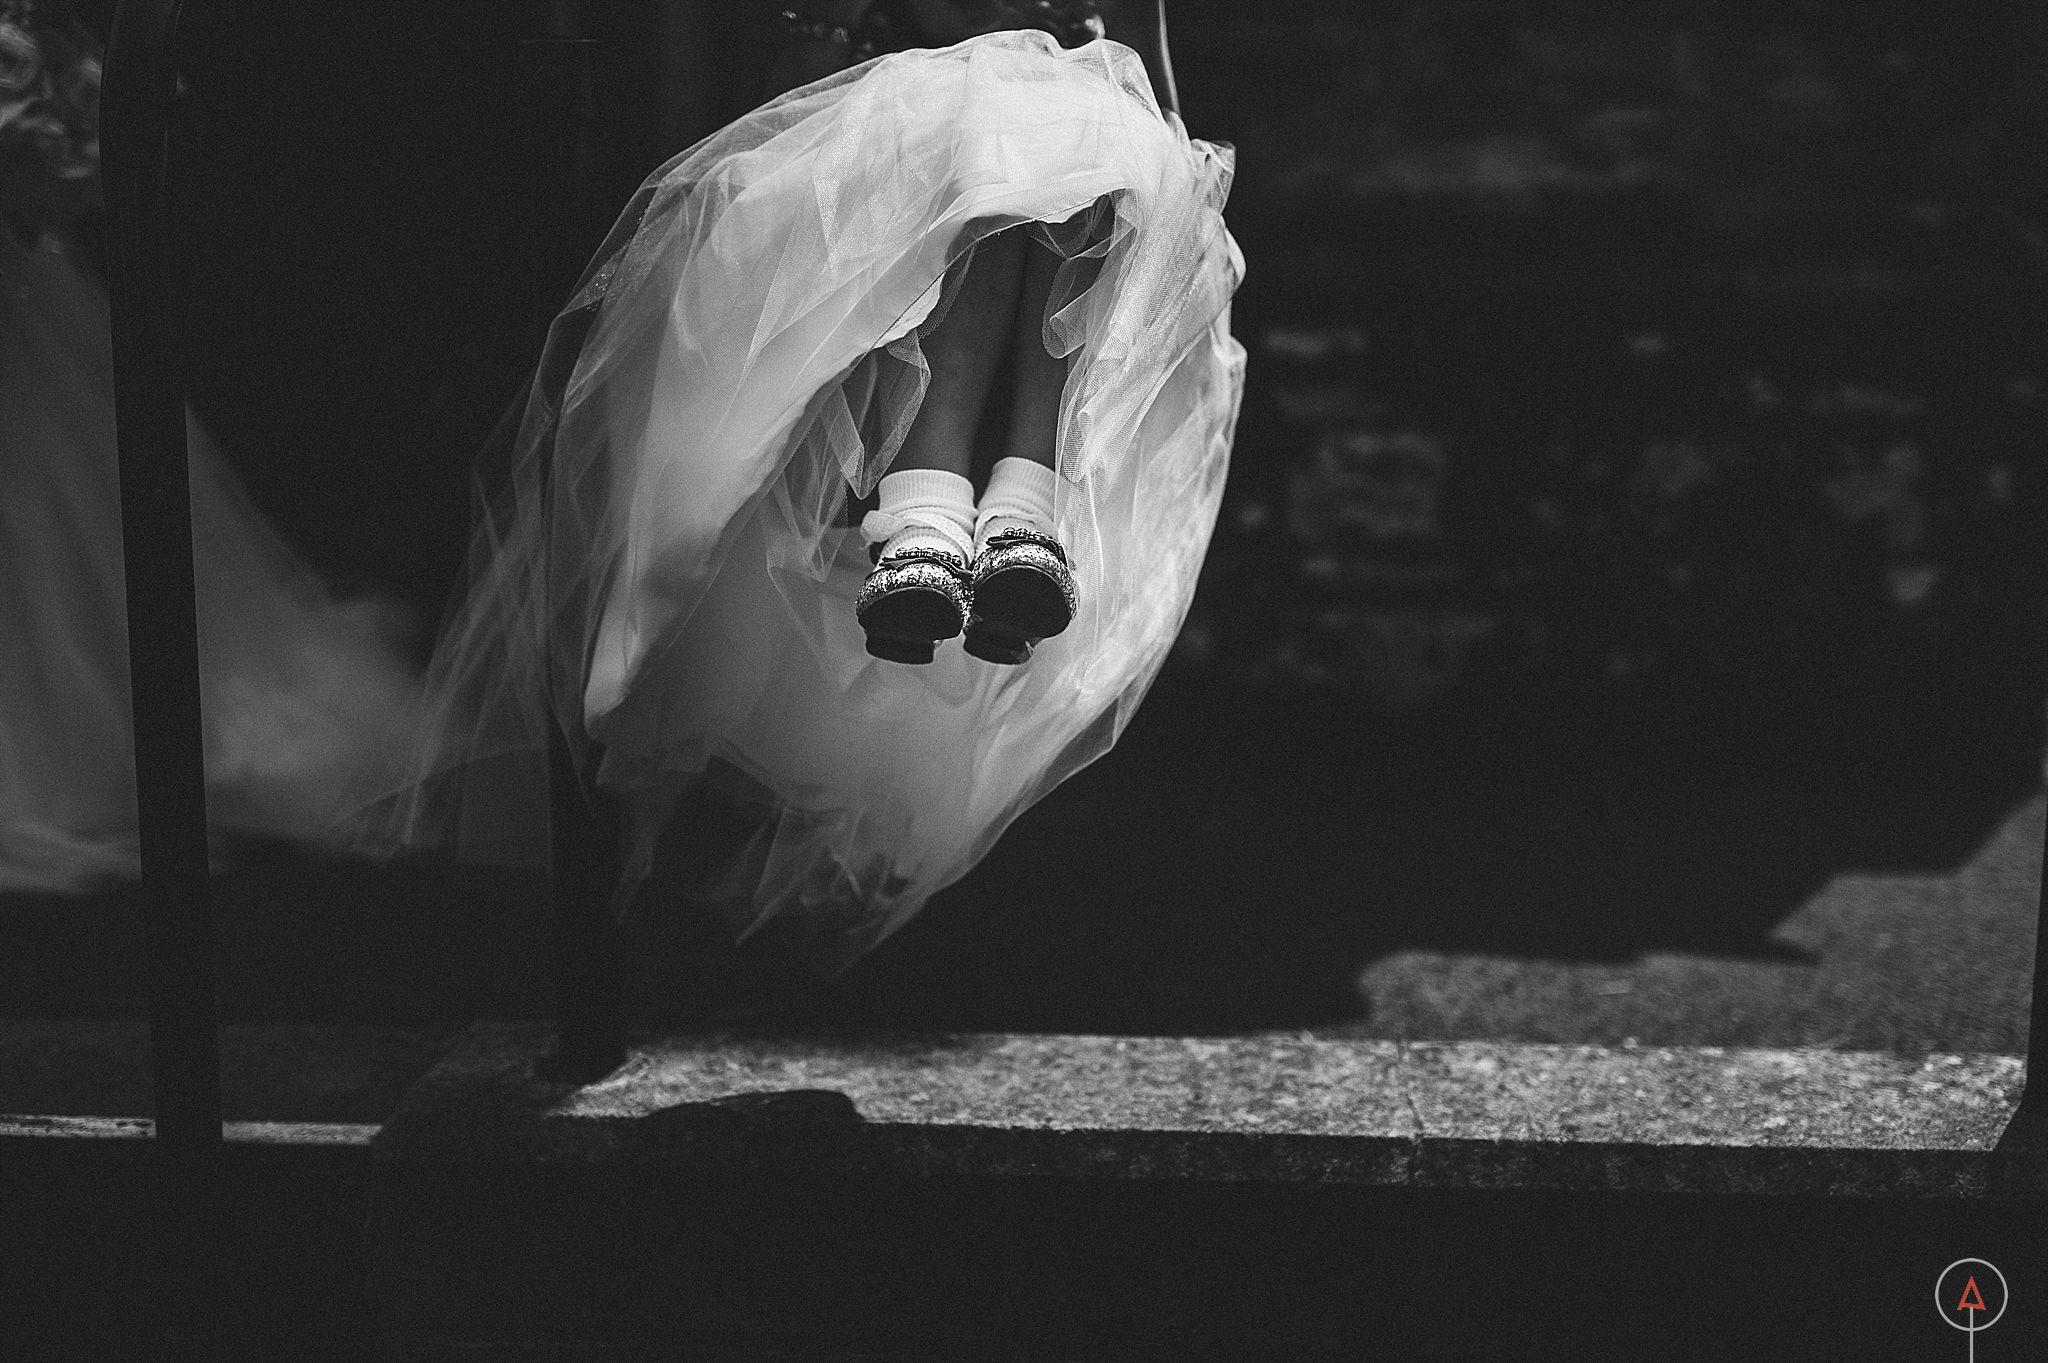 cardiff-wedding-photographer-aga-tomaszek_0376